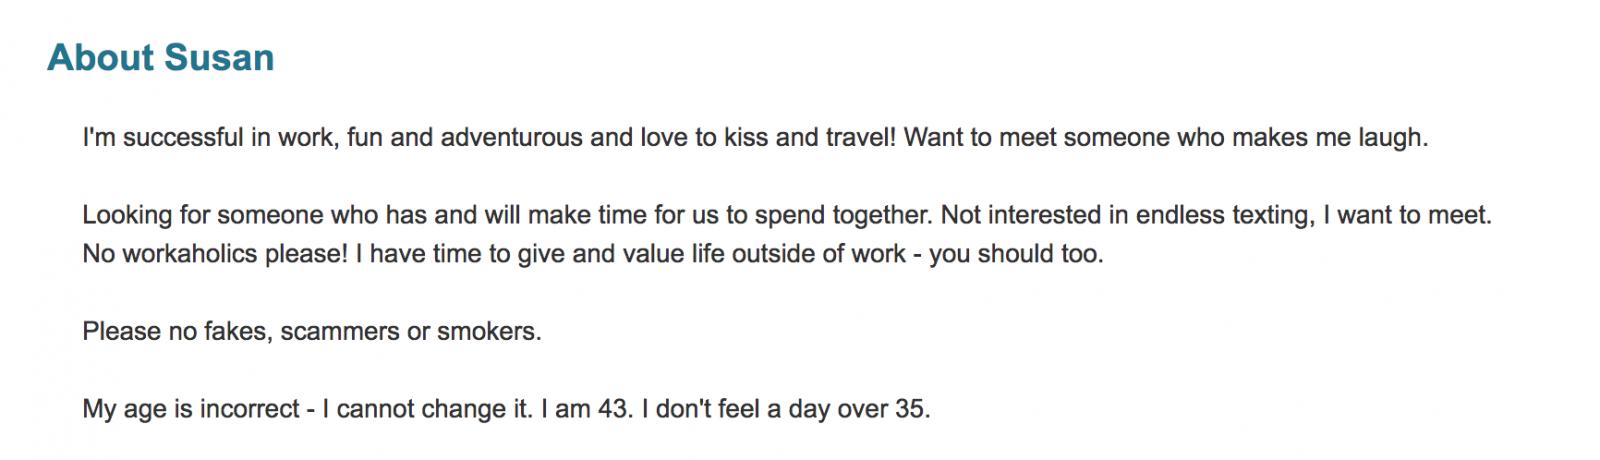 Women Lie On Dating Profiles   ShortGuyCentral